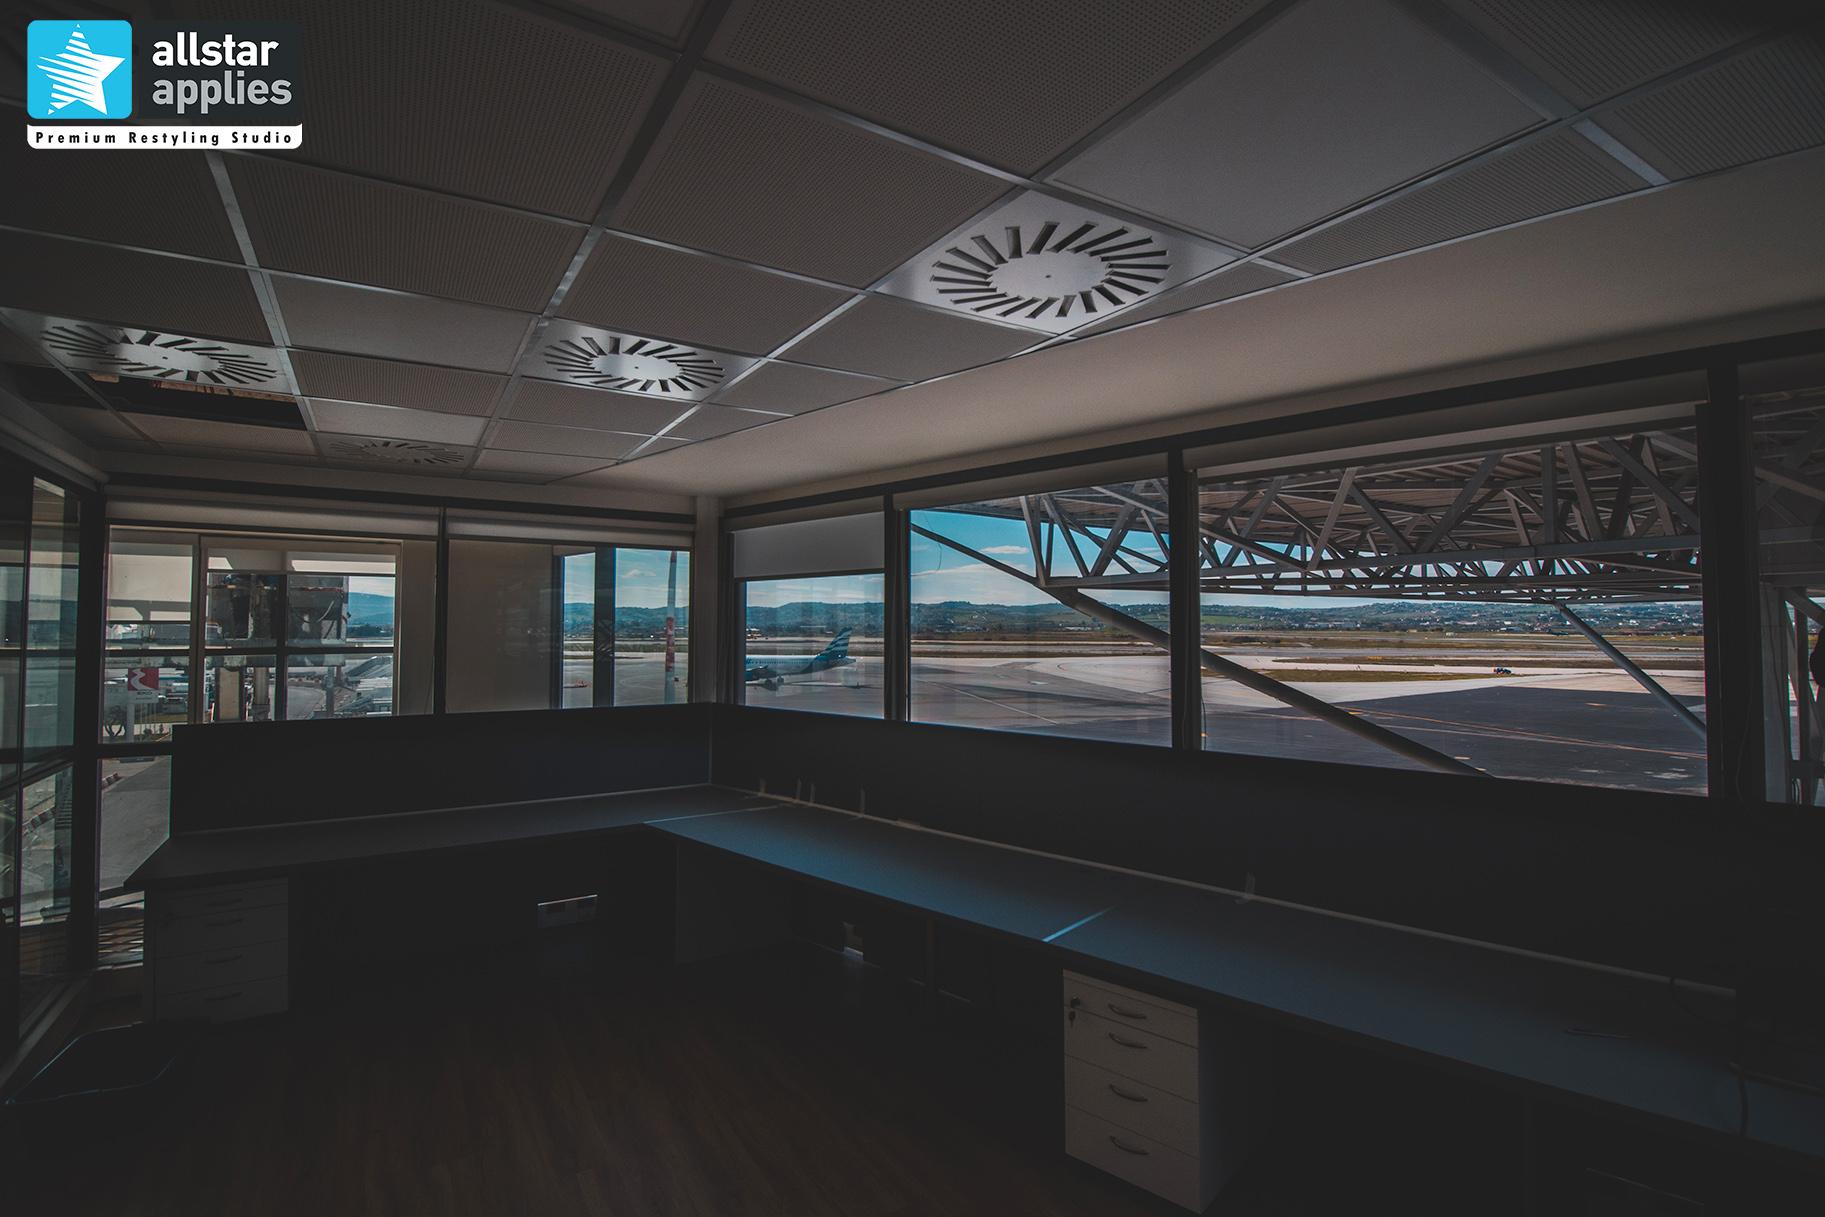 skg airport office 4